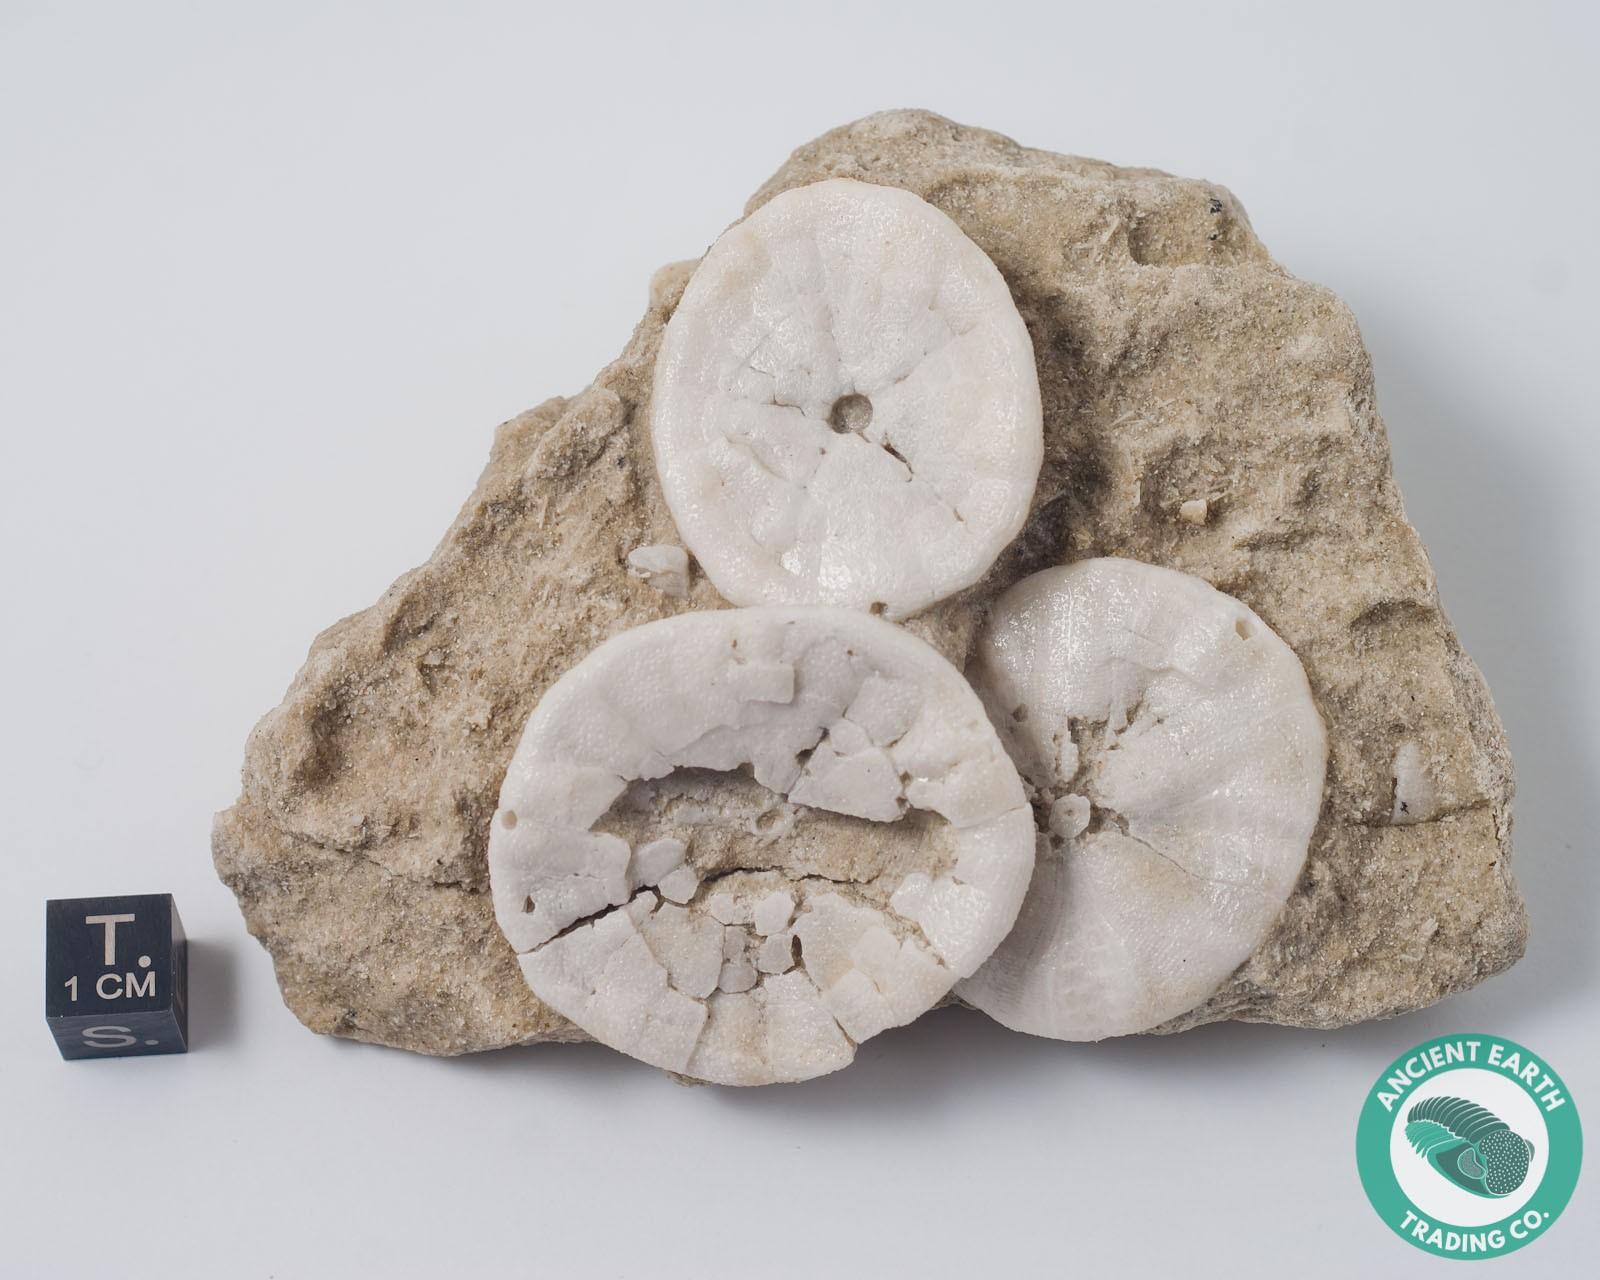 3 Sand Dollar Fossils on Matrix Astrodapsis - California